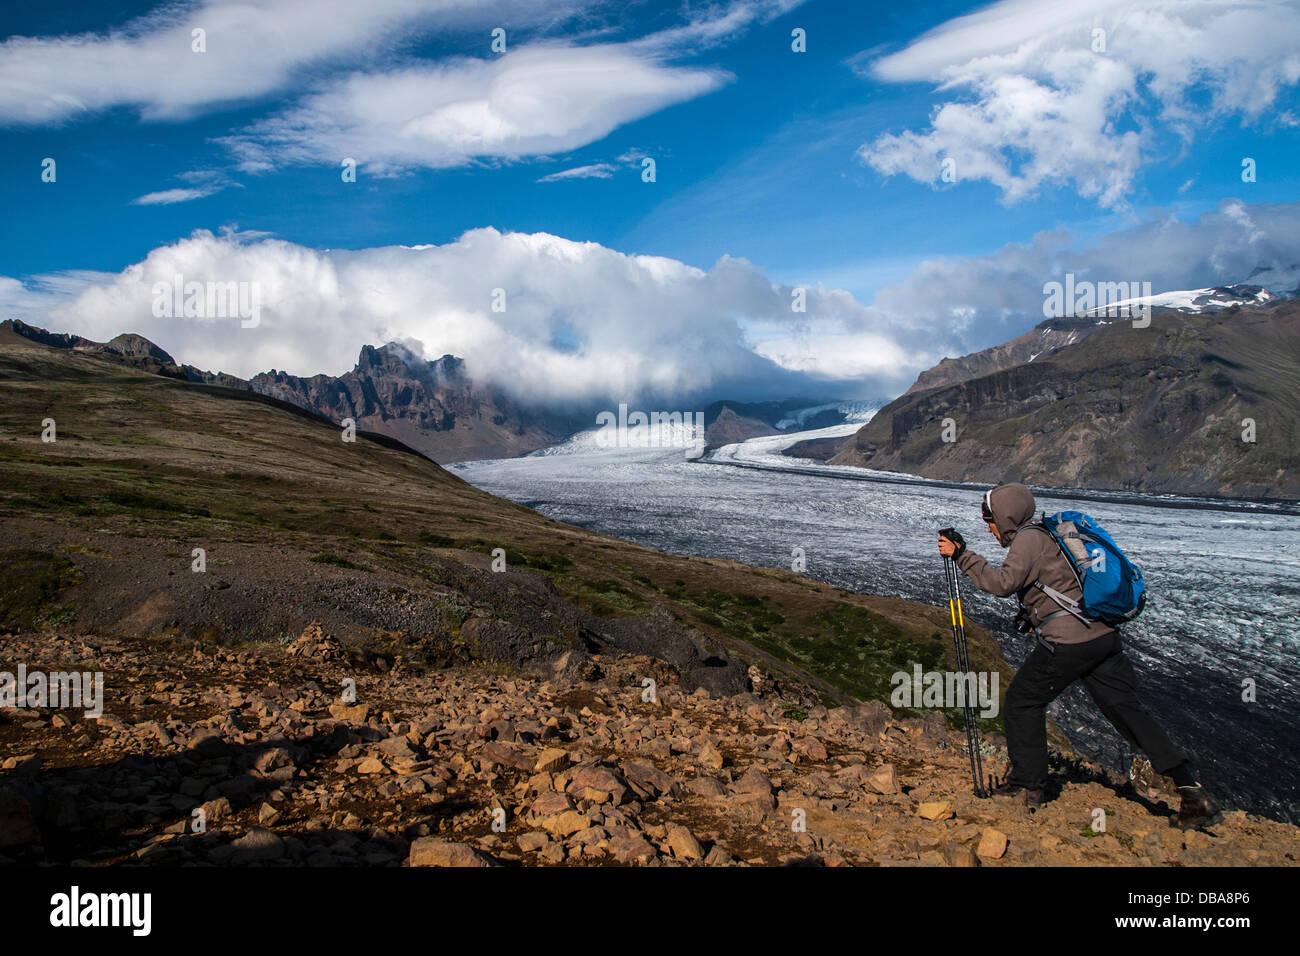 Skaftafell, una de las lenguas of el glaciar Vatnajokull (Parque Nacional de Vatnajökull sur) Islandia, Escandinavia, Europa. Foto de stock